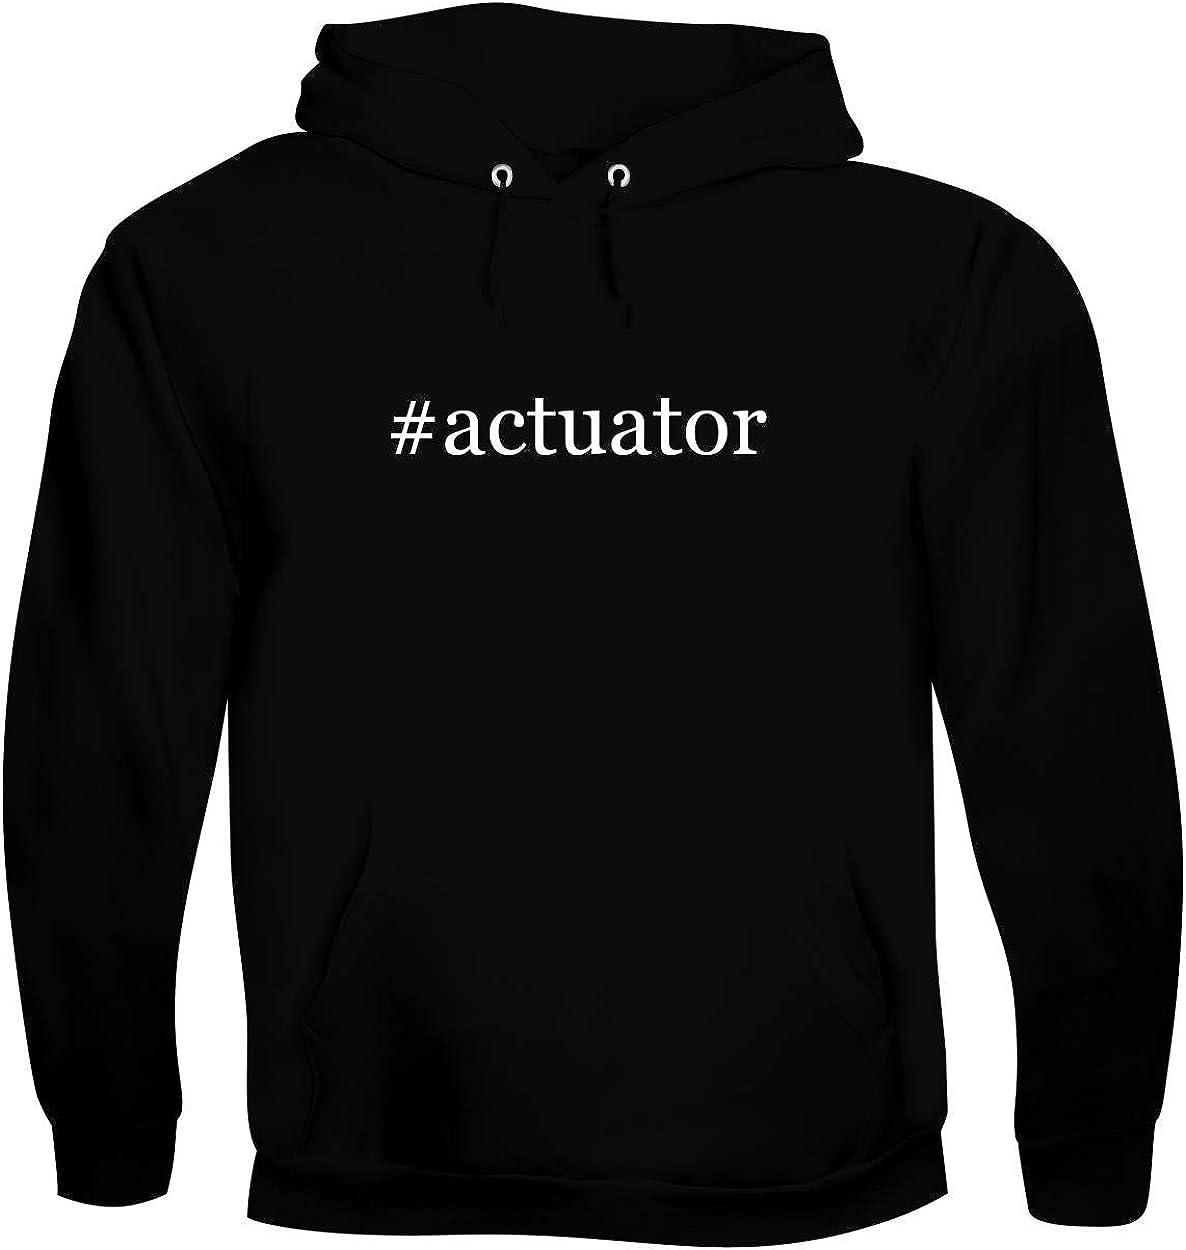 #actuator - Men's Hashtag Soft & Comfortable Hoodie Sweatshirt Pullover